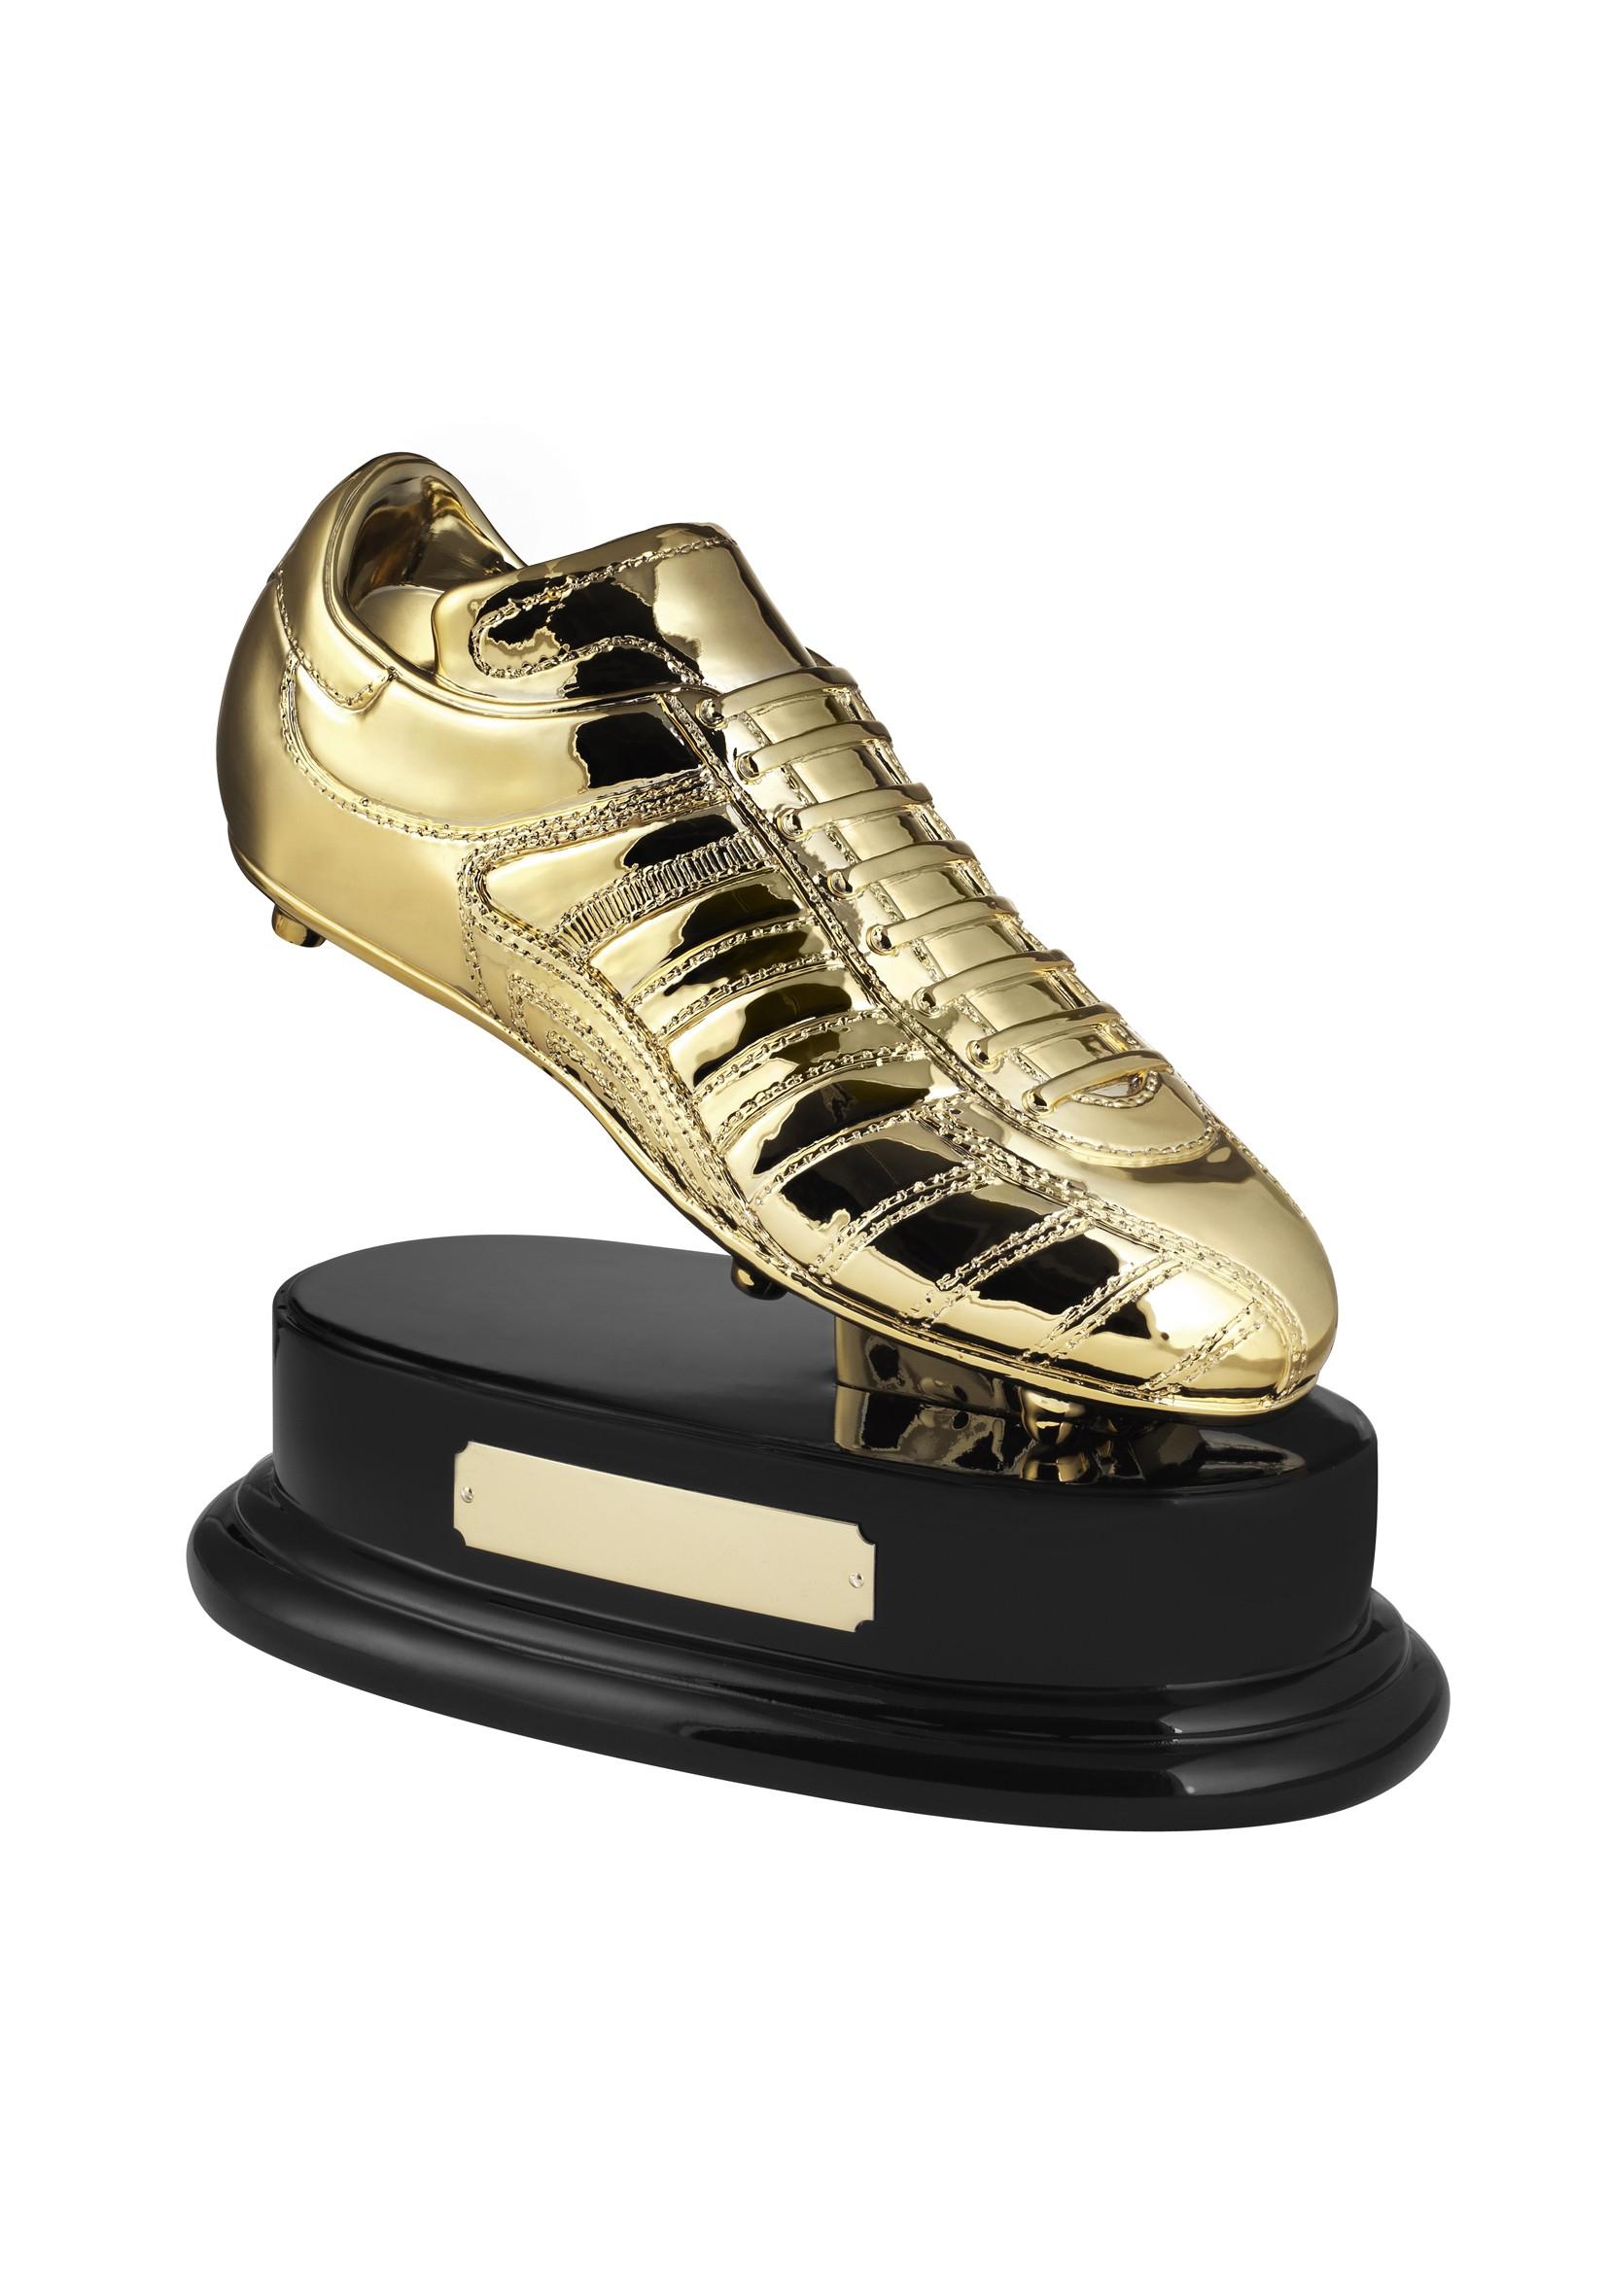 MB 10 x 12.5cm Golden Boot Football Award